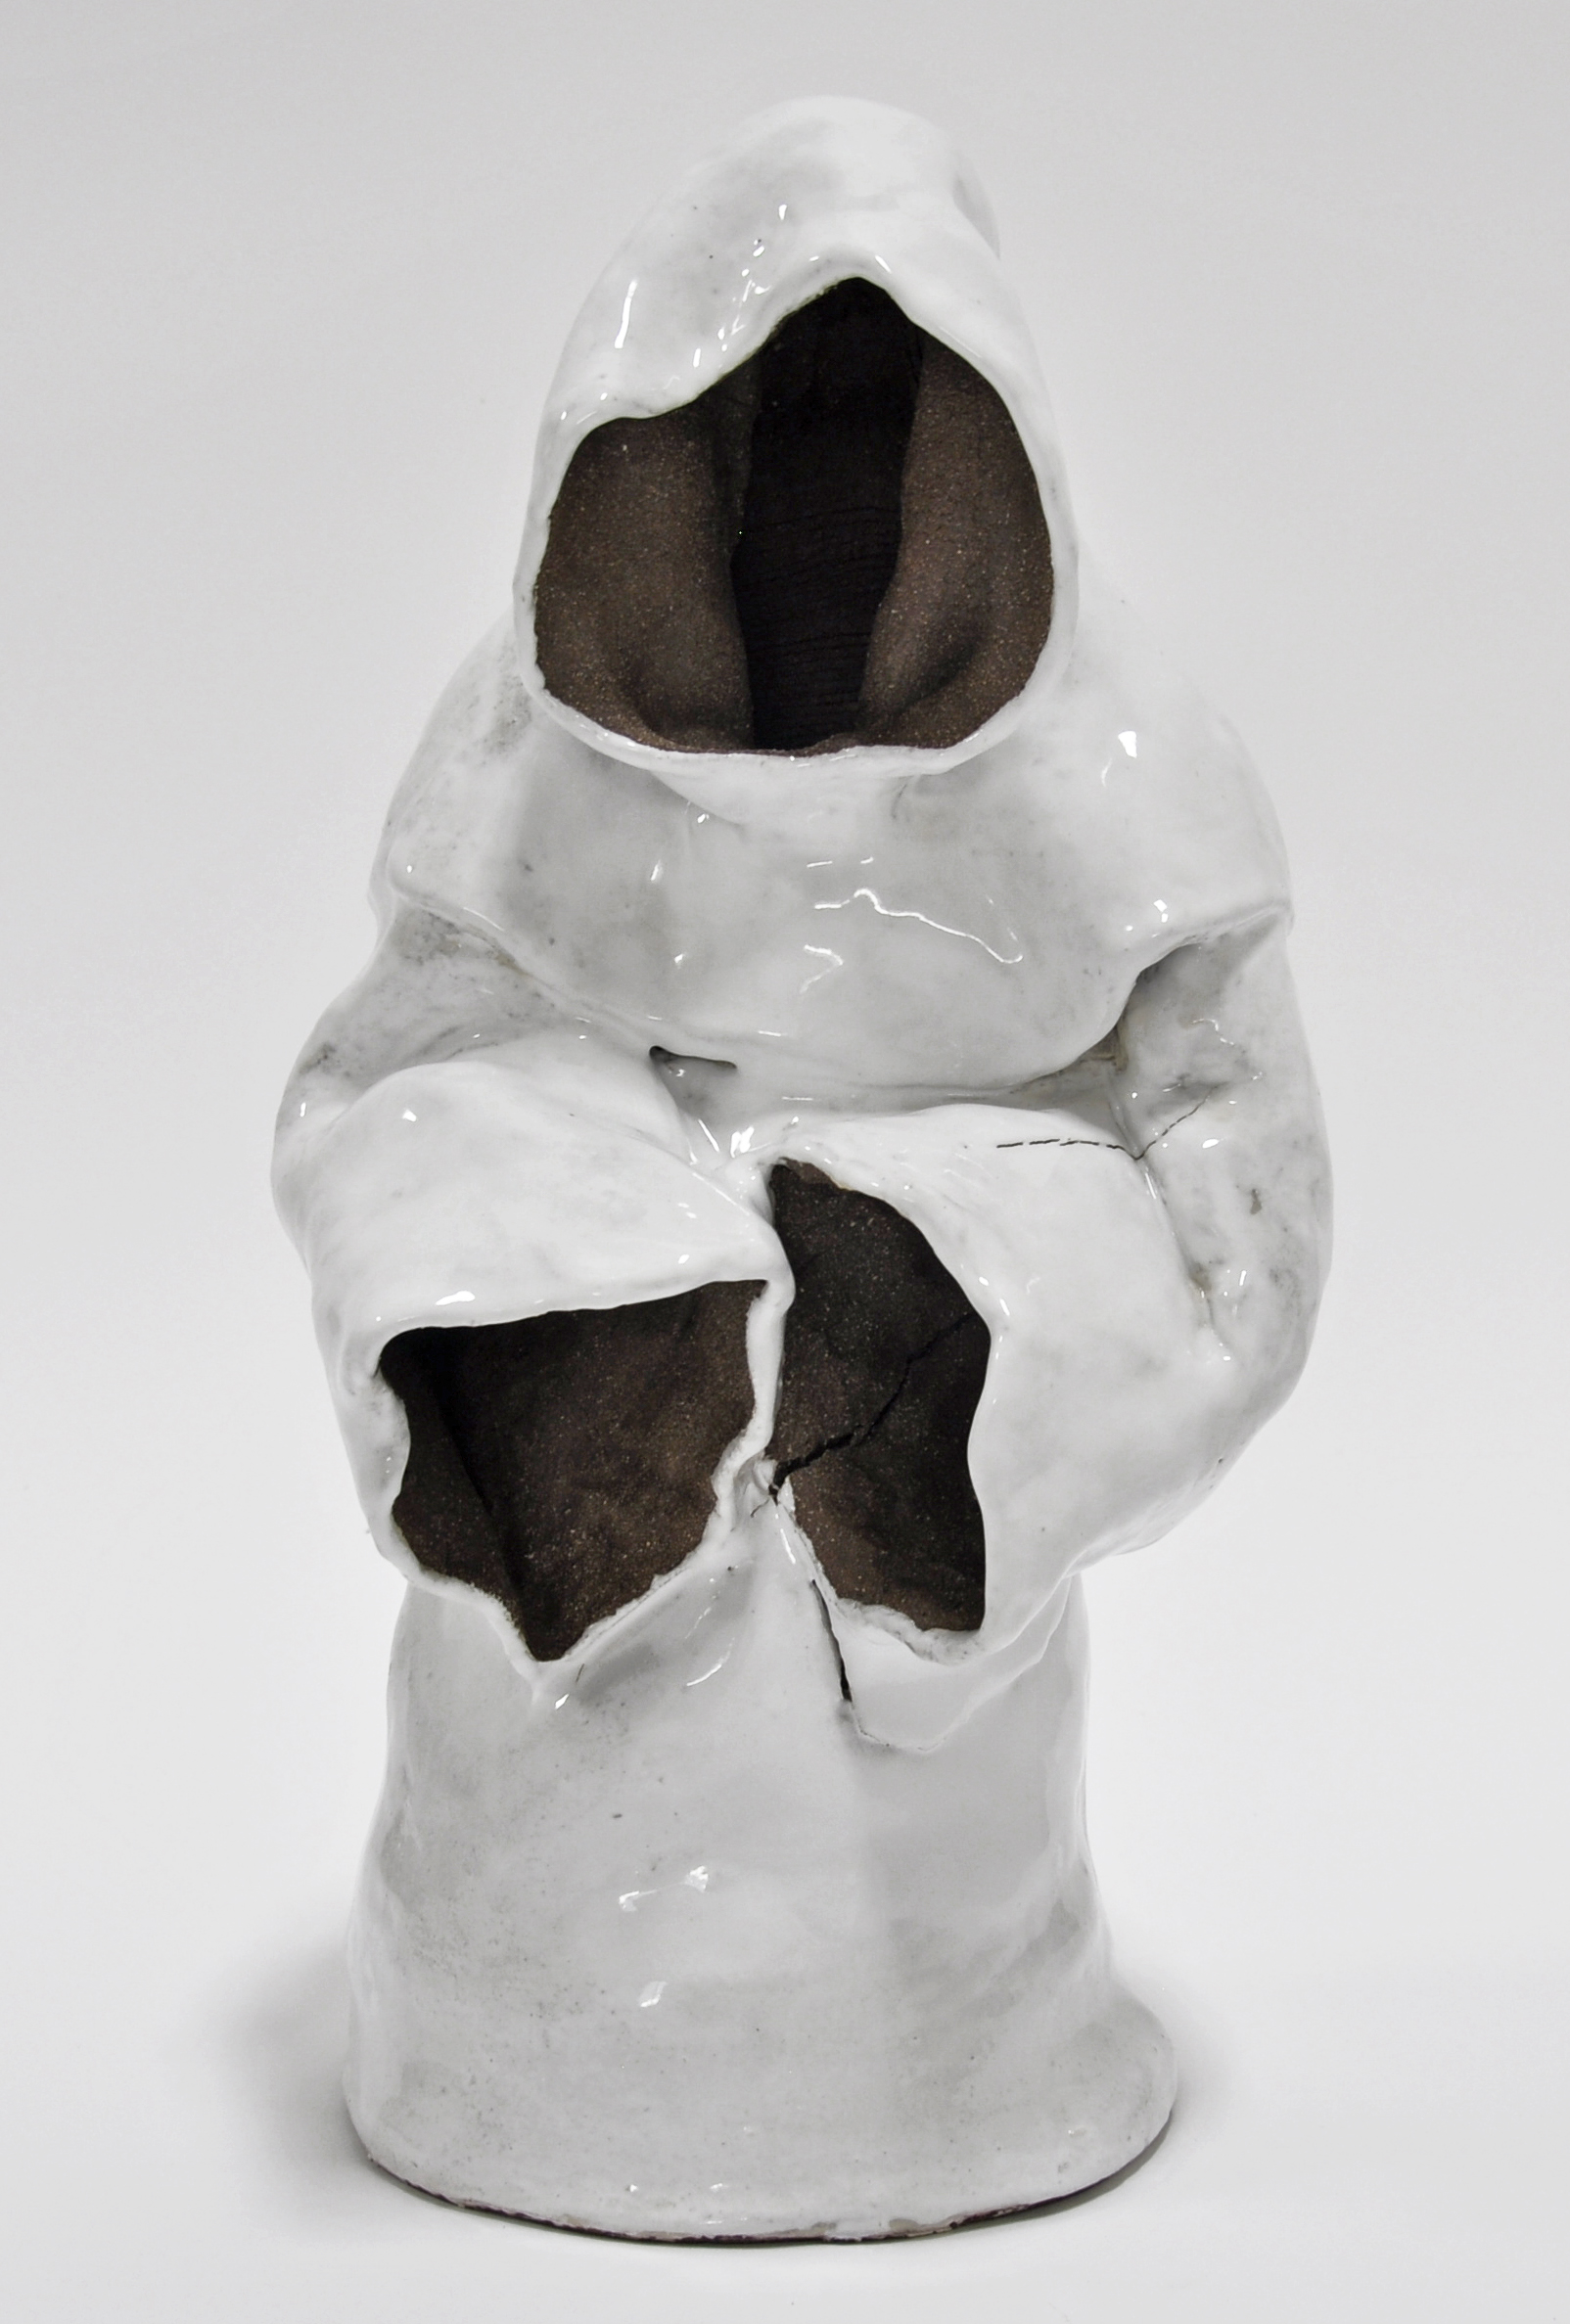 Nick Makanna, Mourner III, 2019, Glazed ceramic, 19 x 9 x 10 in, $2000